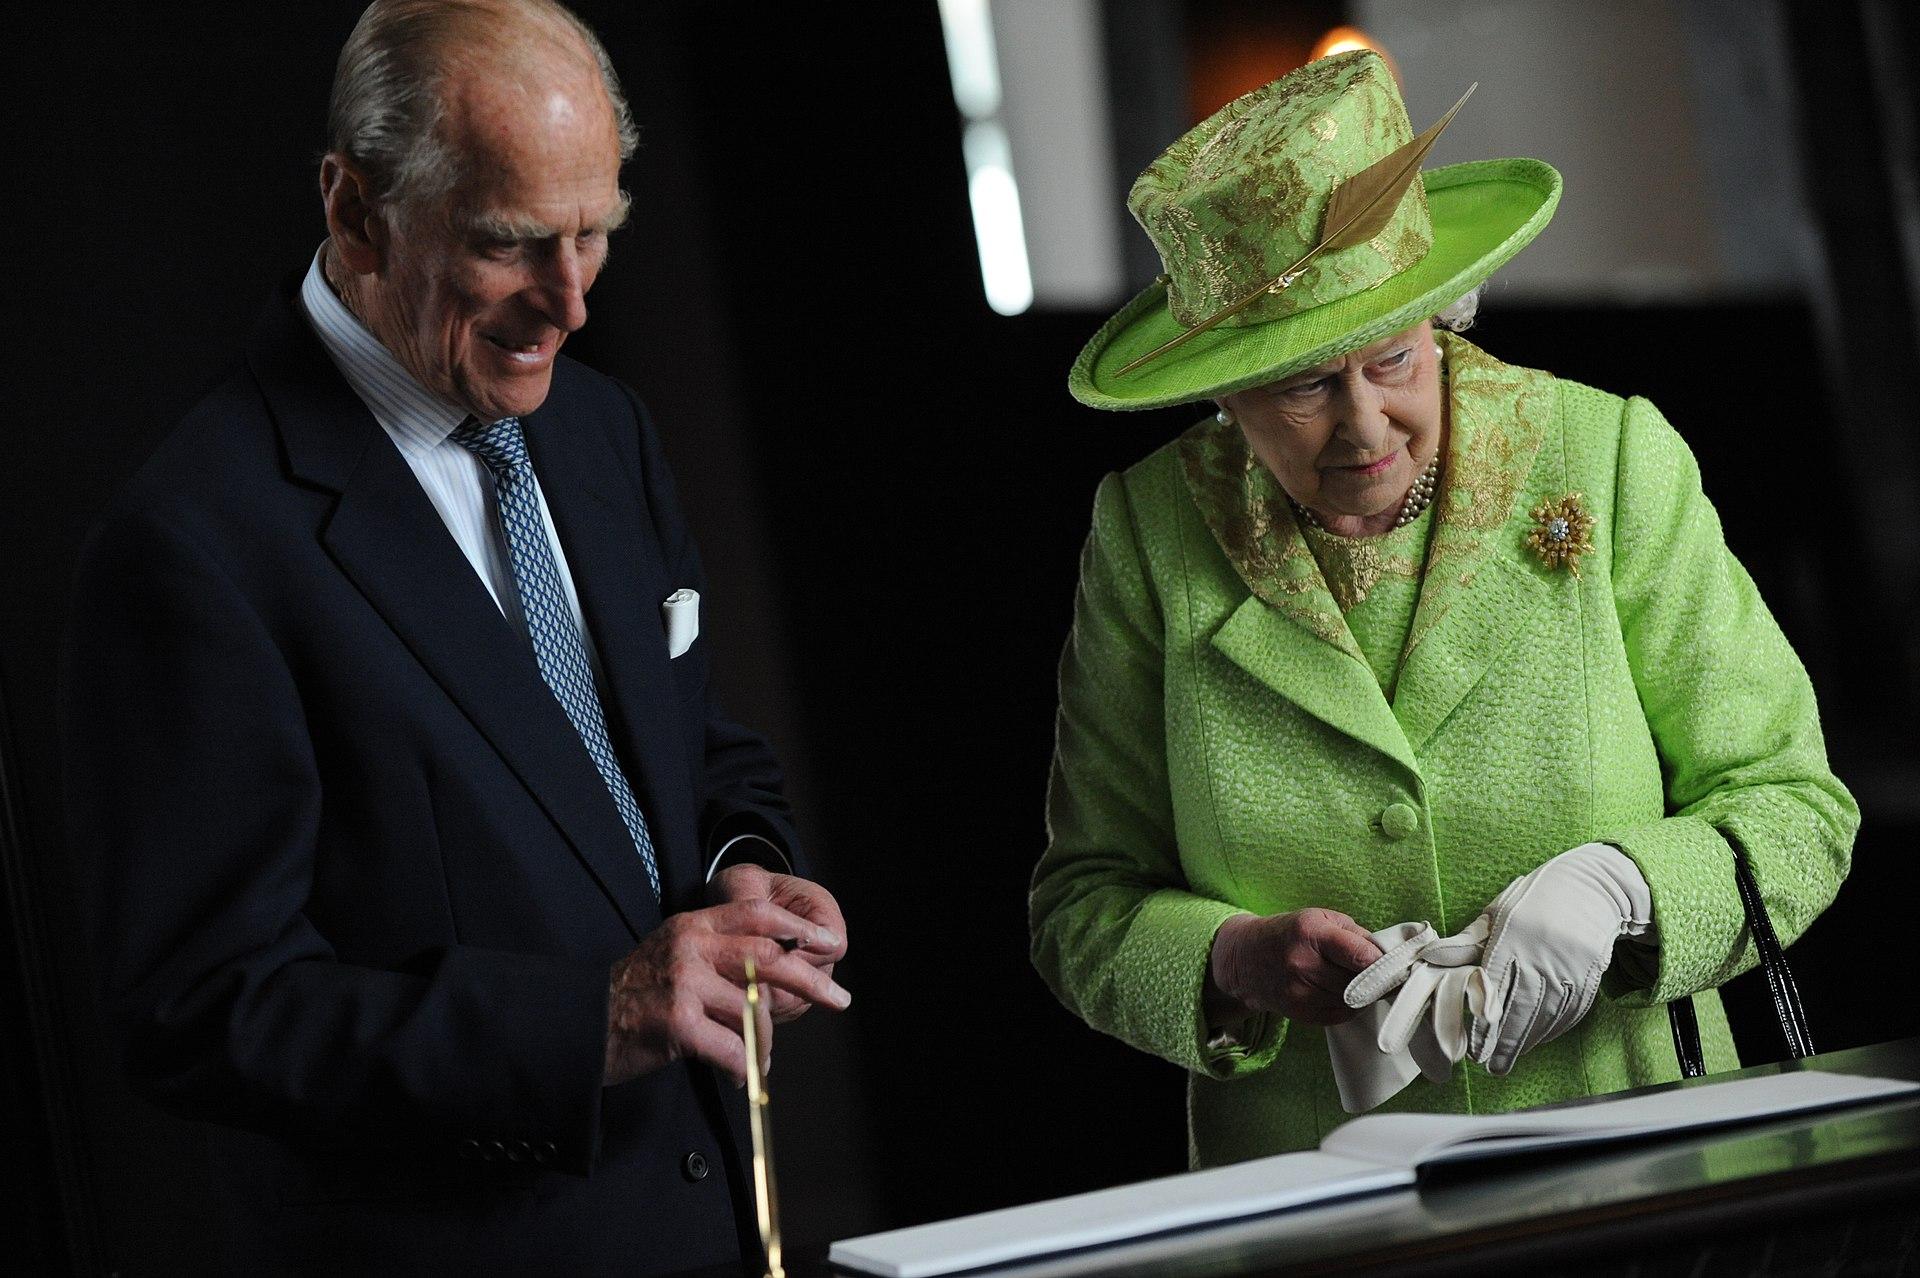 British Royal Family Bids Final Farewell To Prince Philip, Duke of Edinburgh